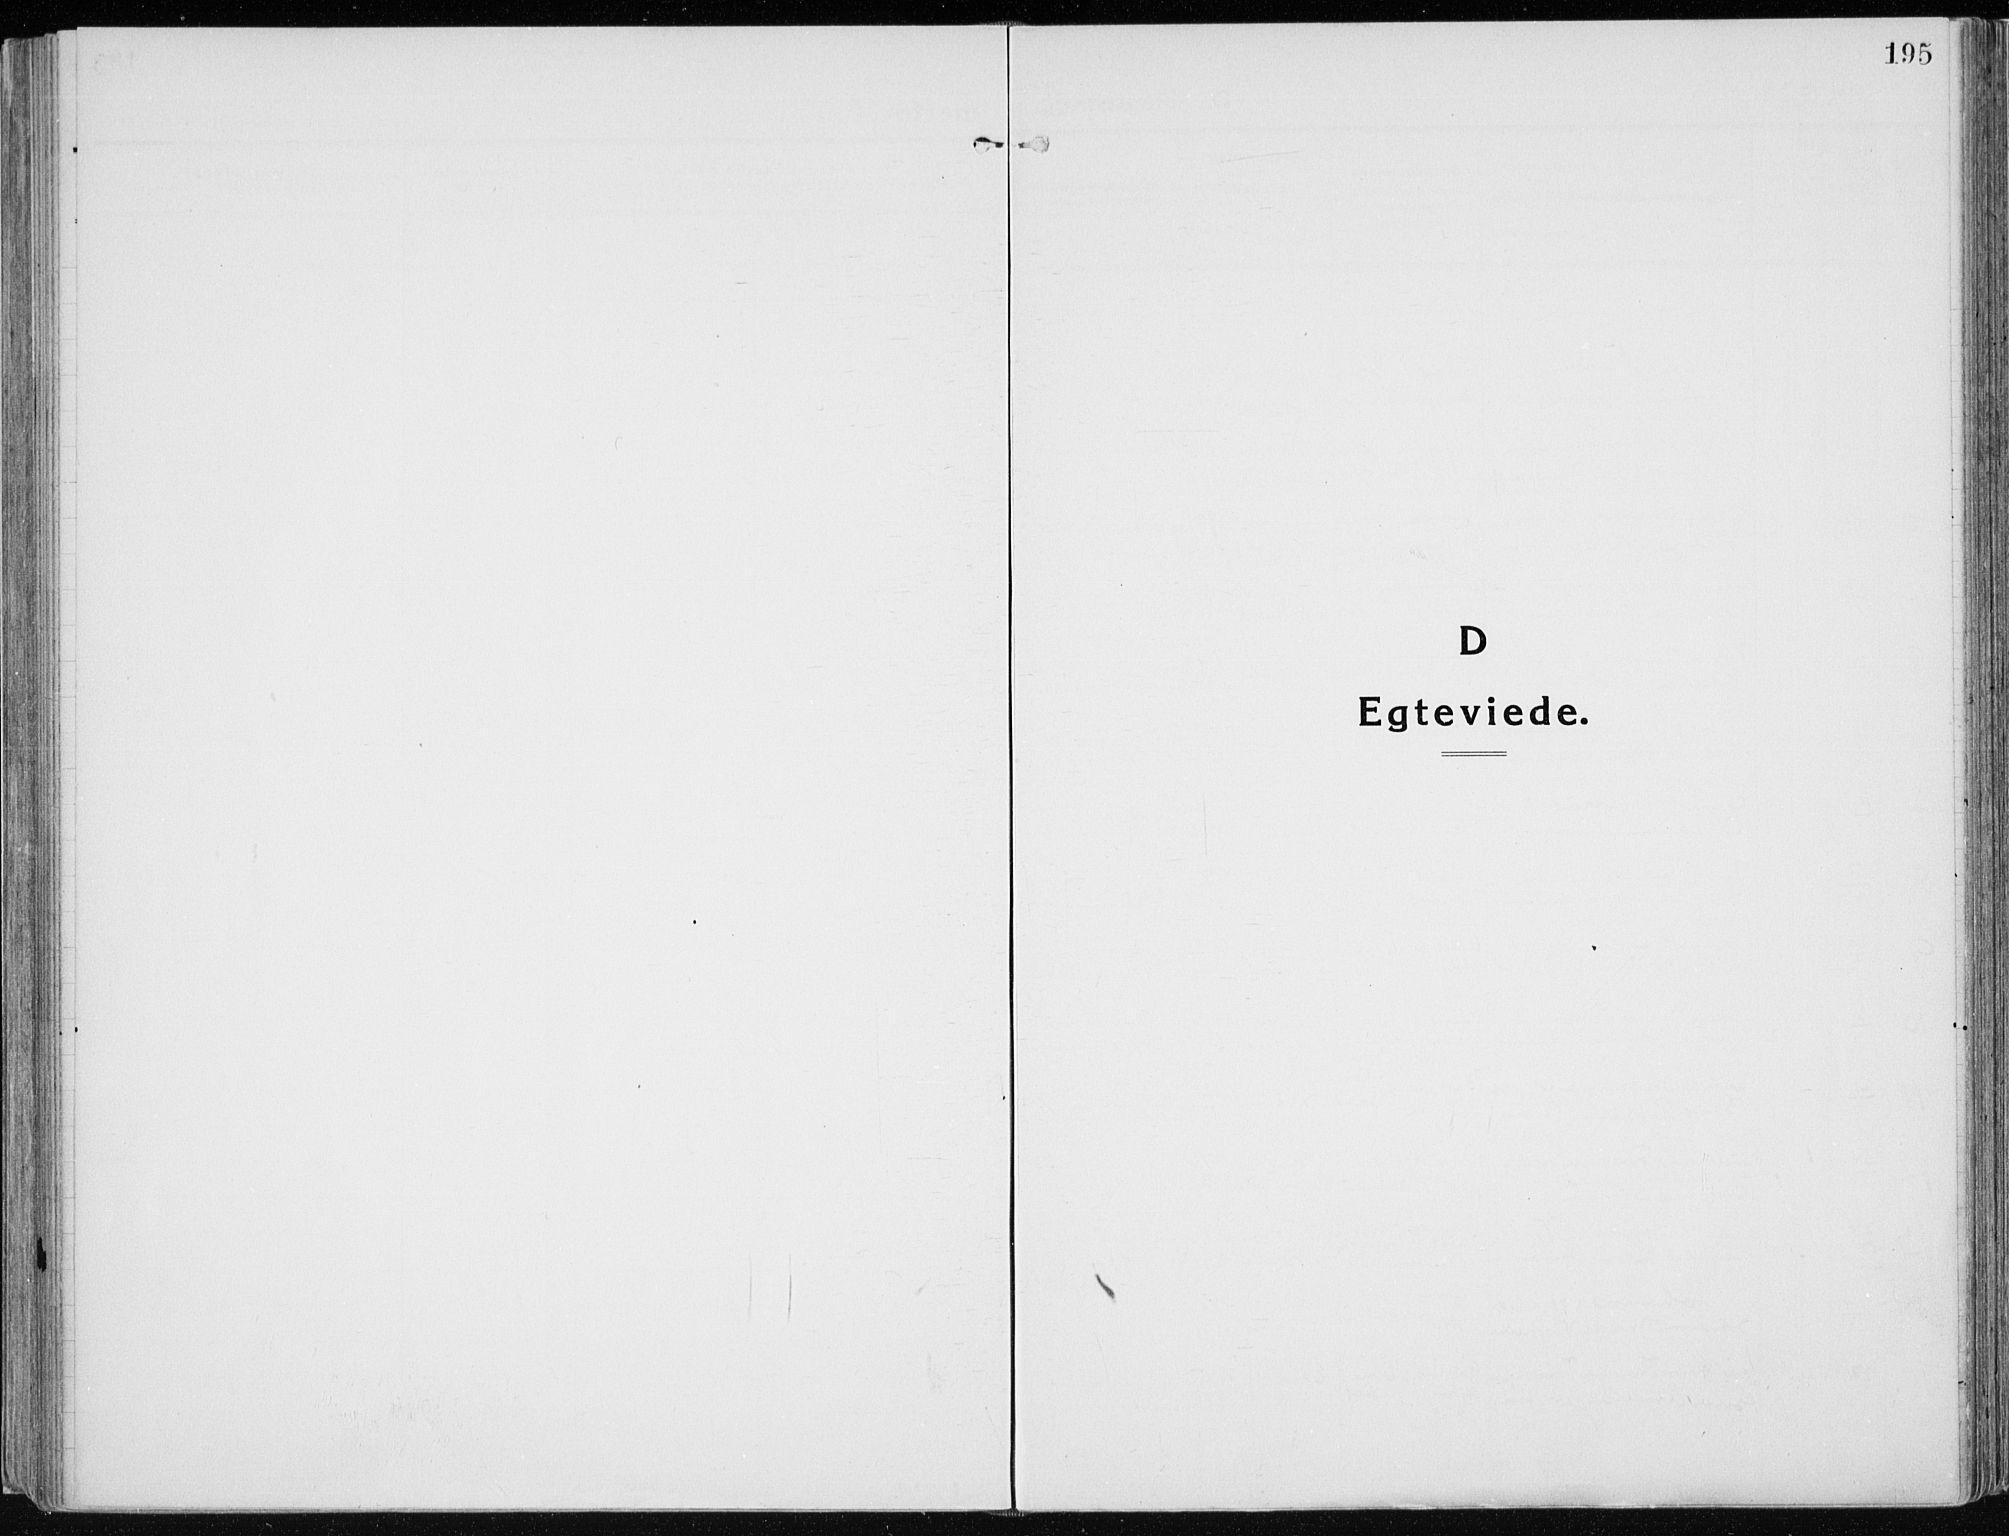 SAH, Vardal prestekontor, H/Ha/Haa/L0015: Ministerialbok nr. 15, 1923-1937, s. 195